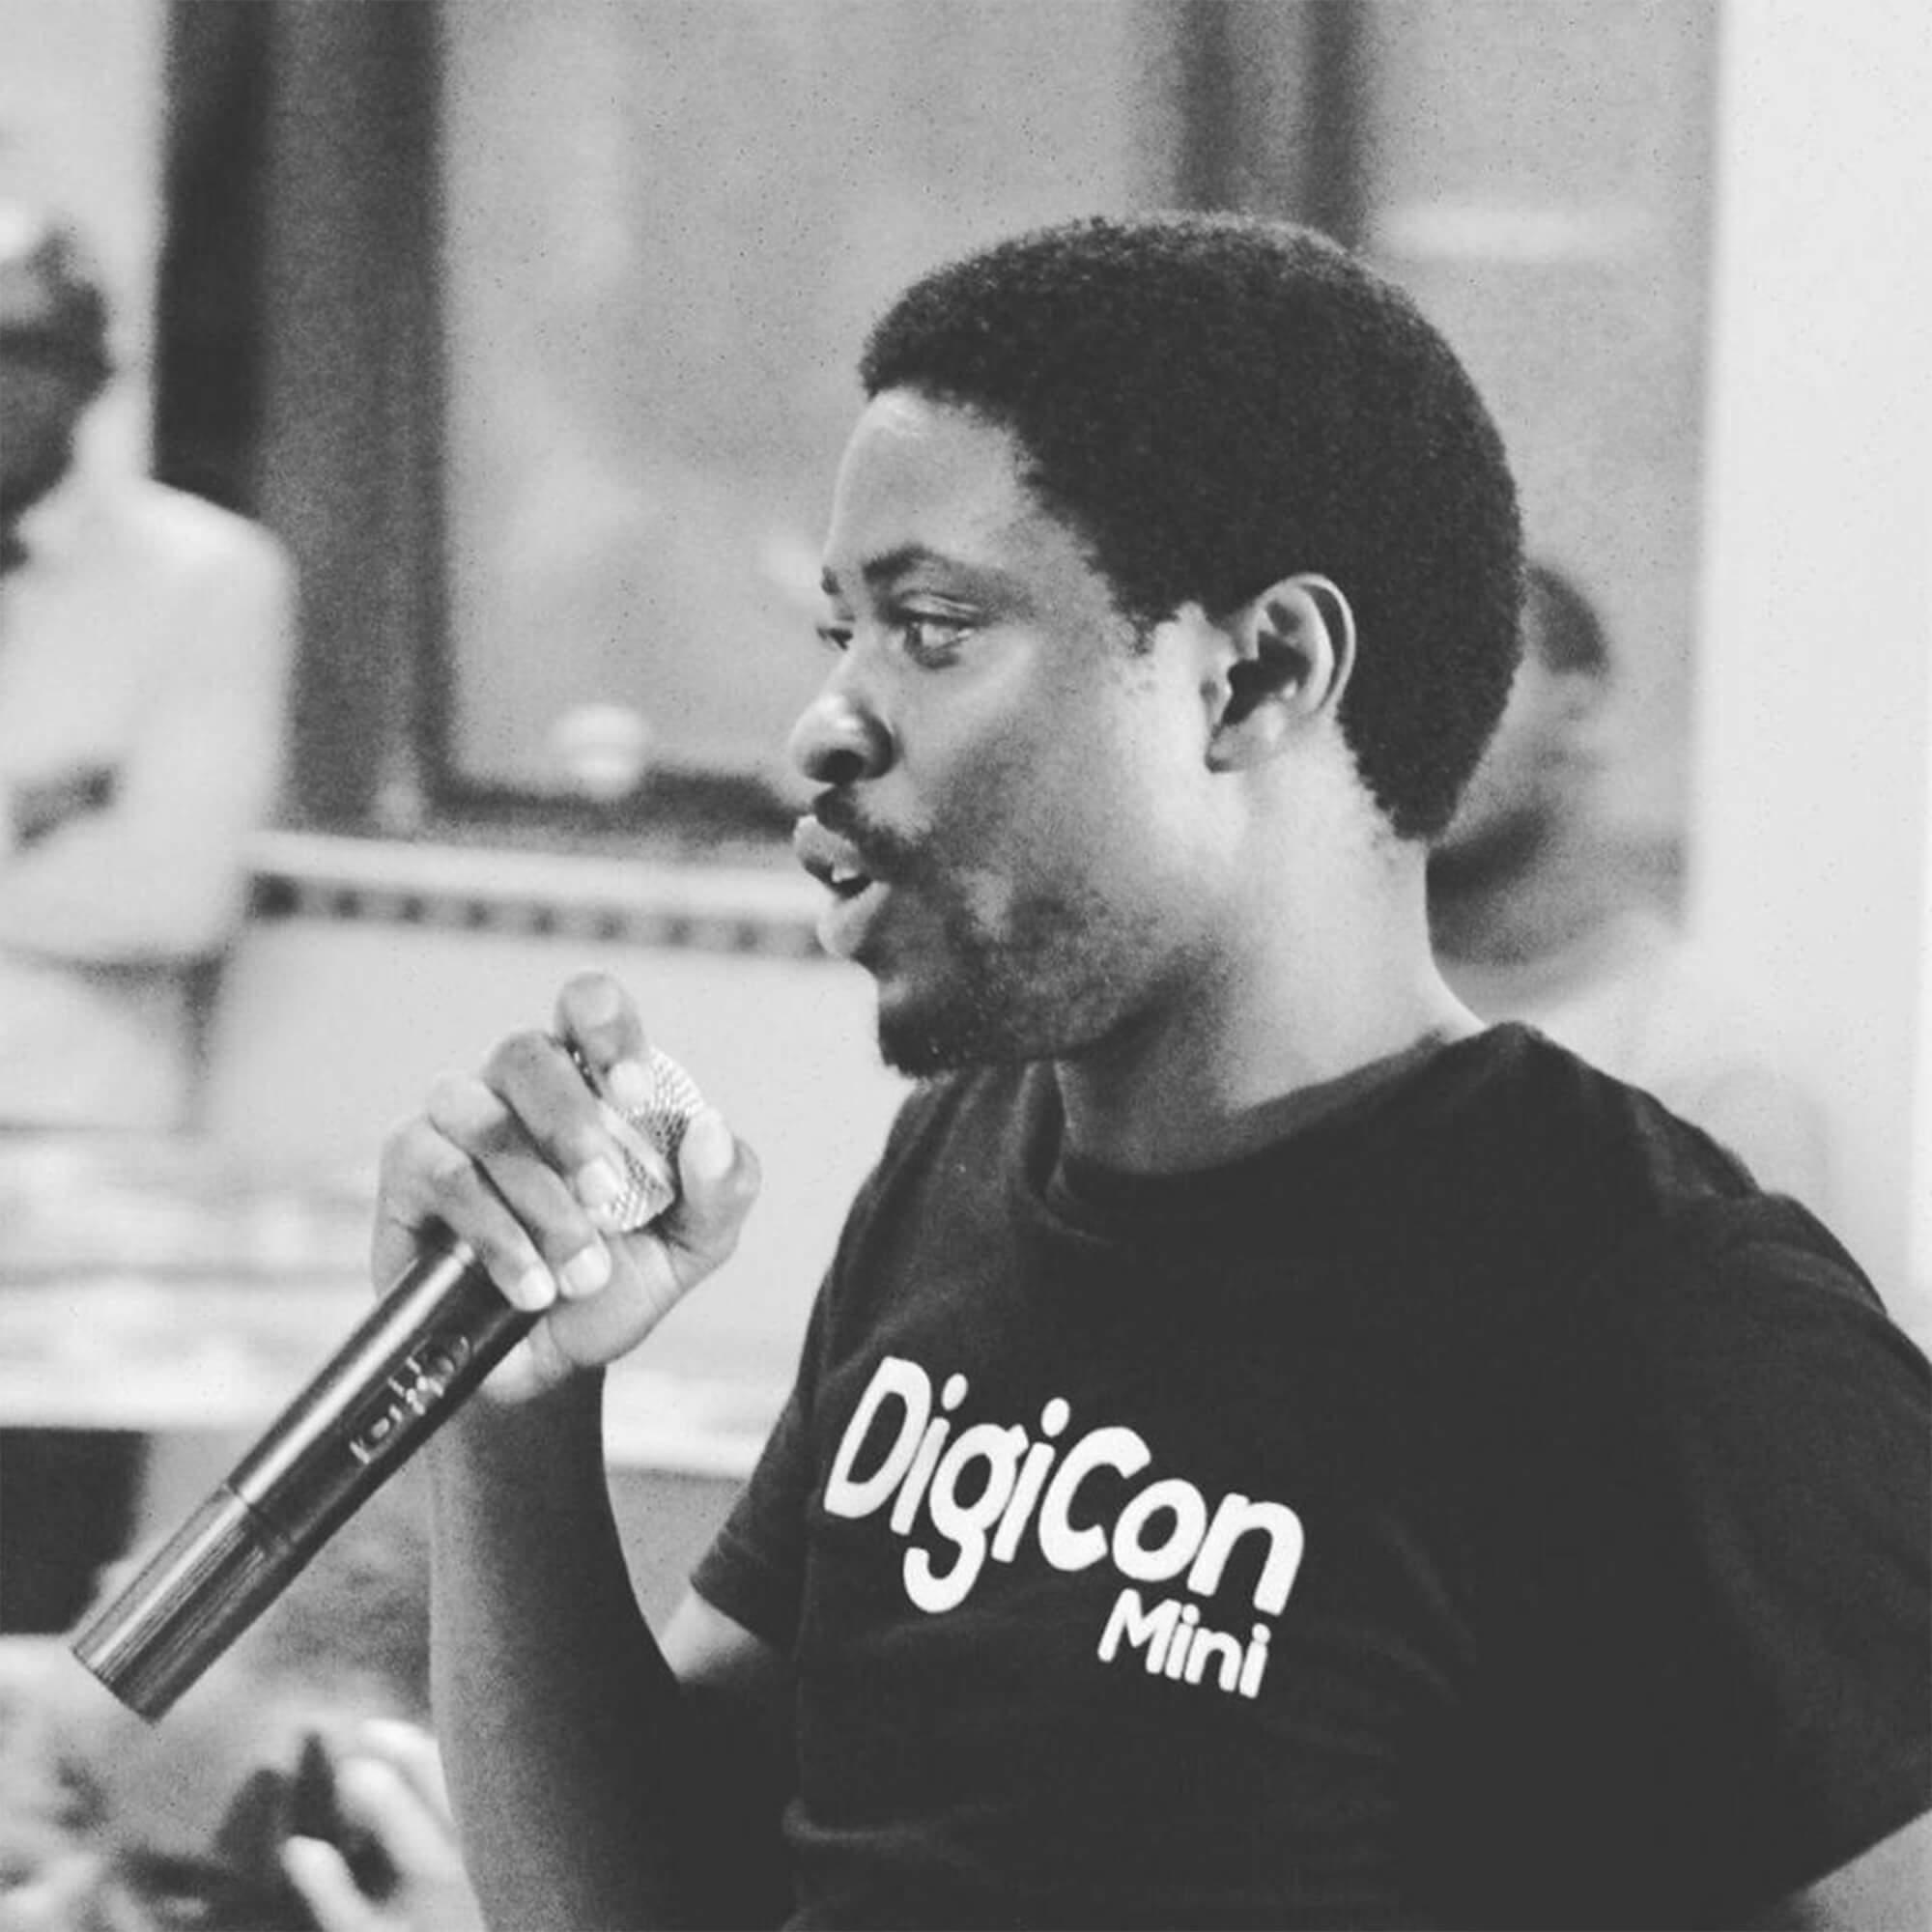 Aaron Musoke